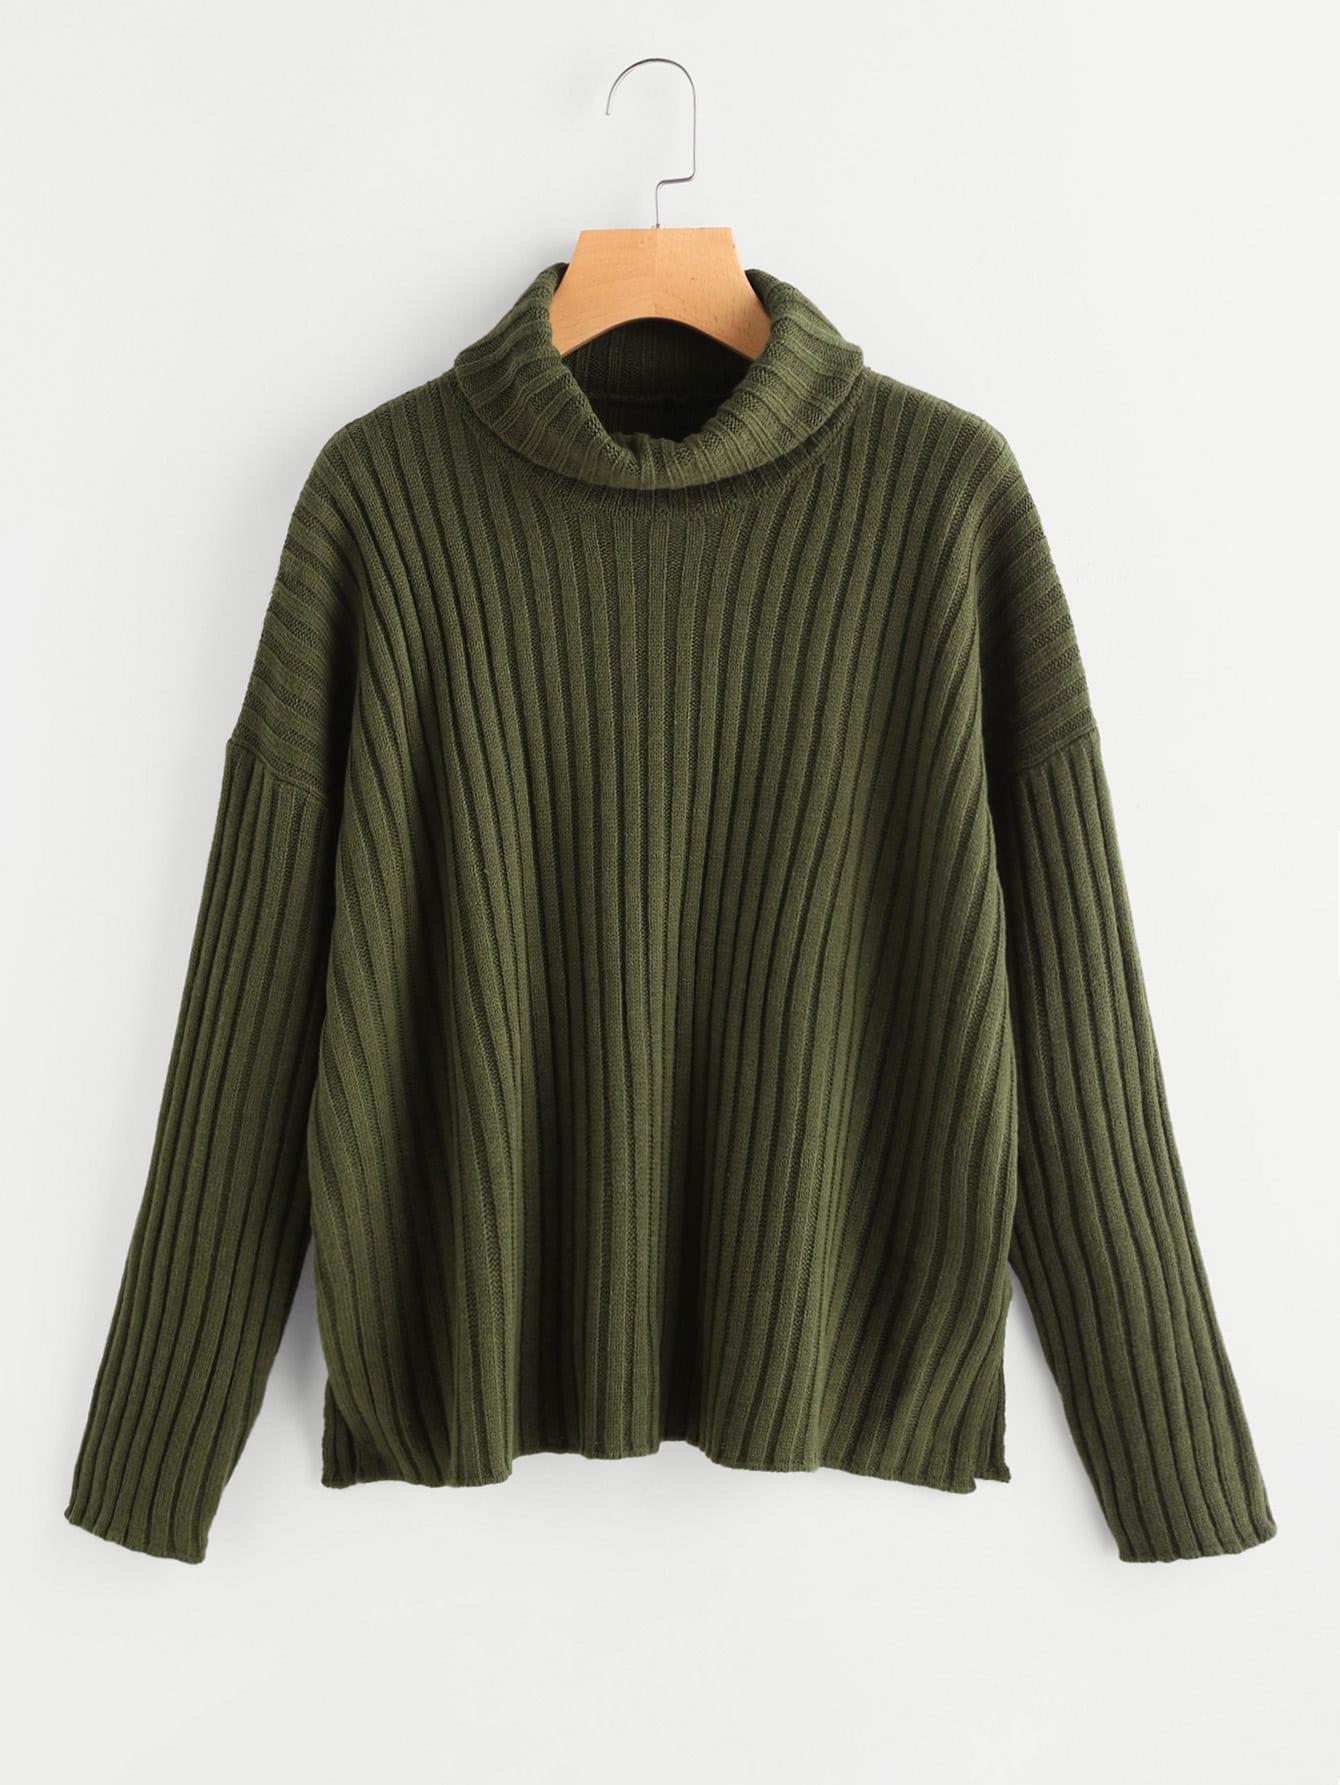 Roll Neck Drop Shoulder Rib Knit Jumper sweater170706461